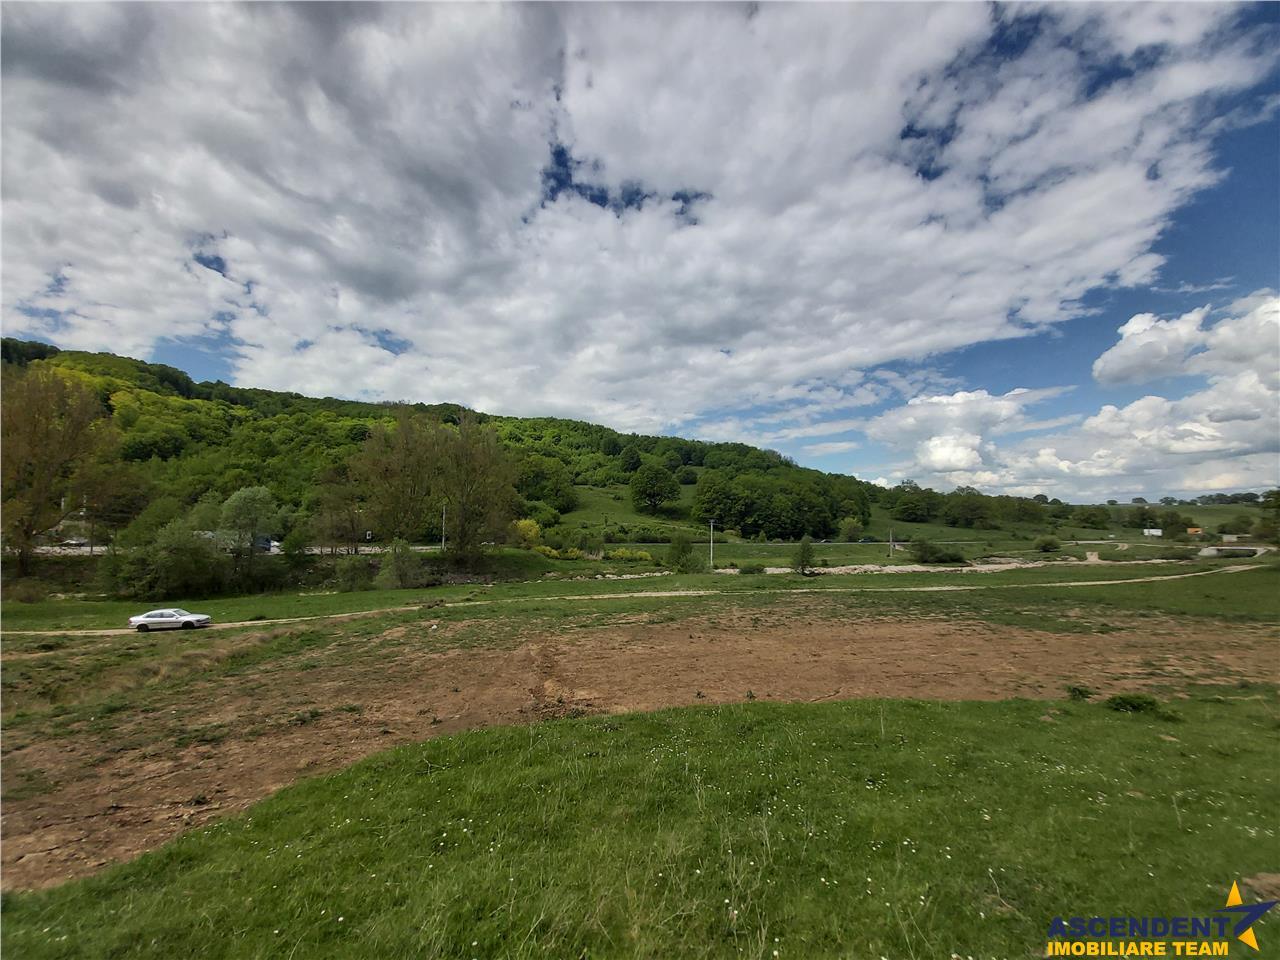 Teren pentru investitie in statiune turistica, Valea Maierusului, Brasov